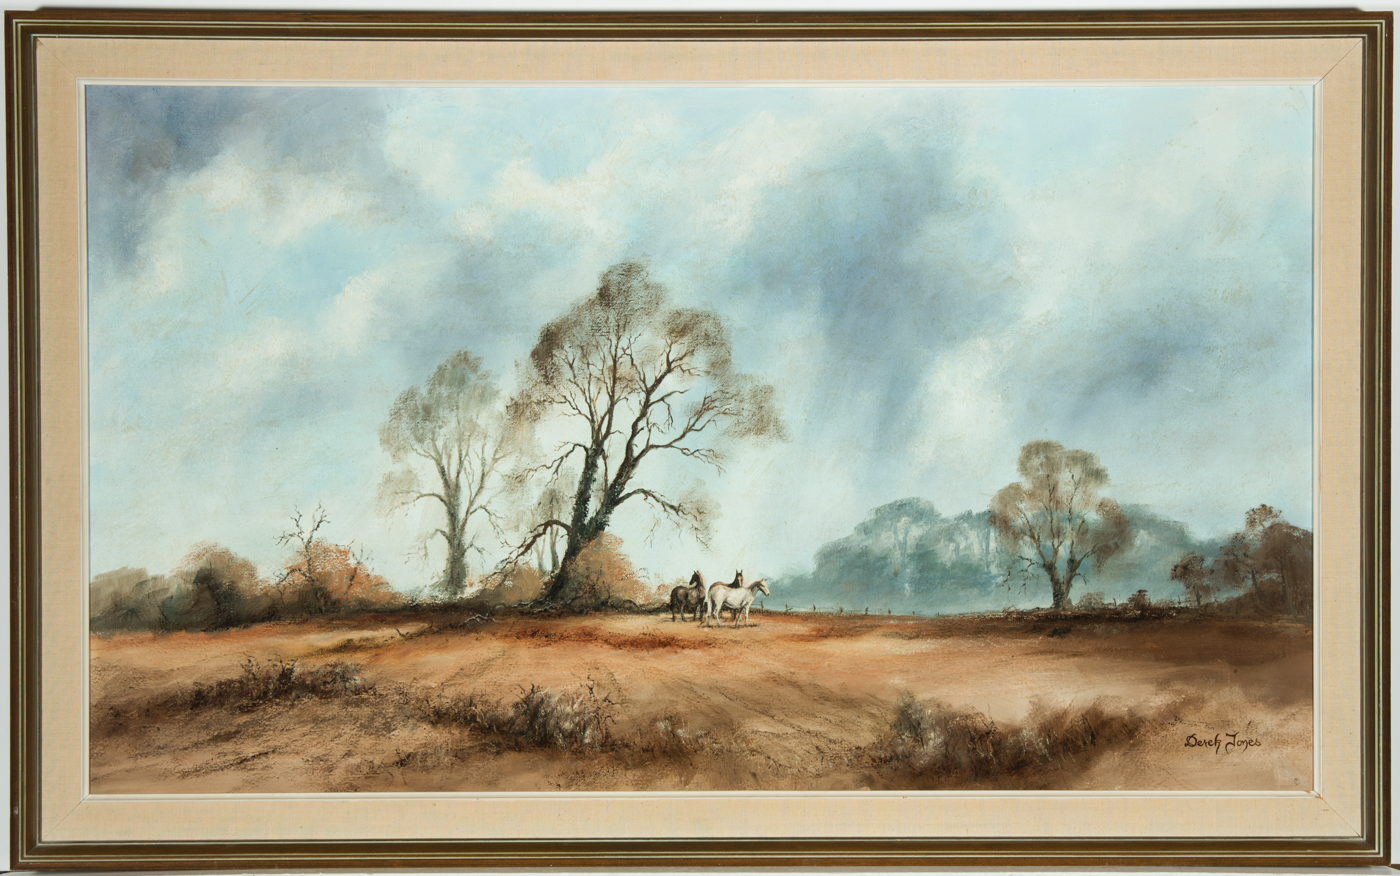 Derek Jones - Signed c. 1978 Oil, Horses in a Barren Autumn Landscape